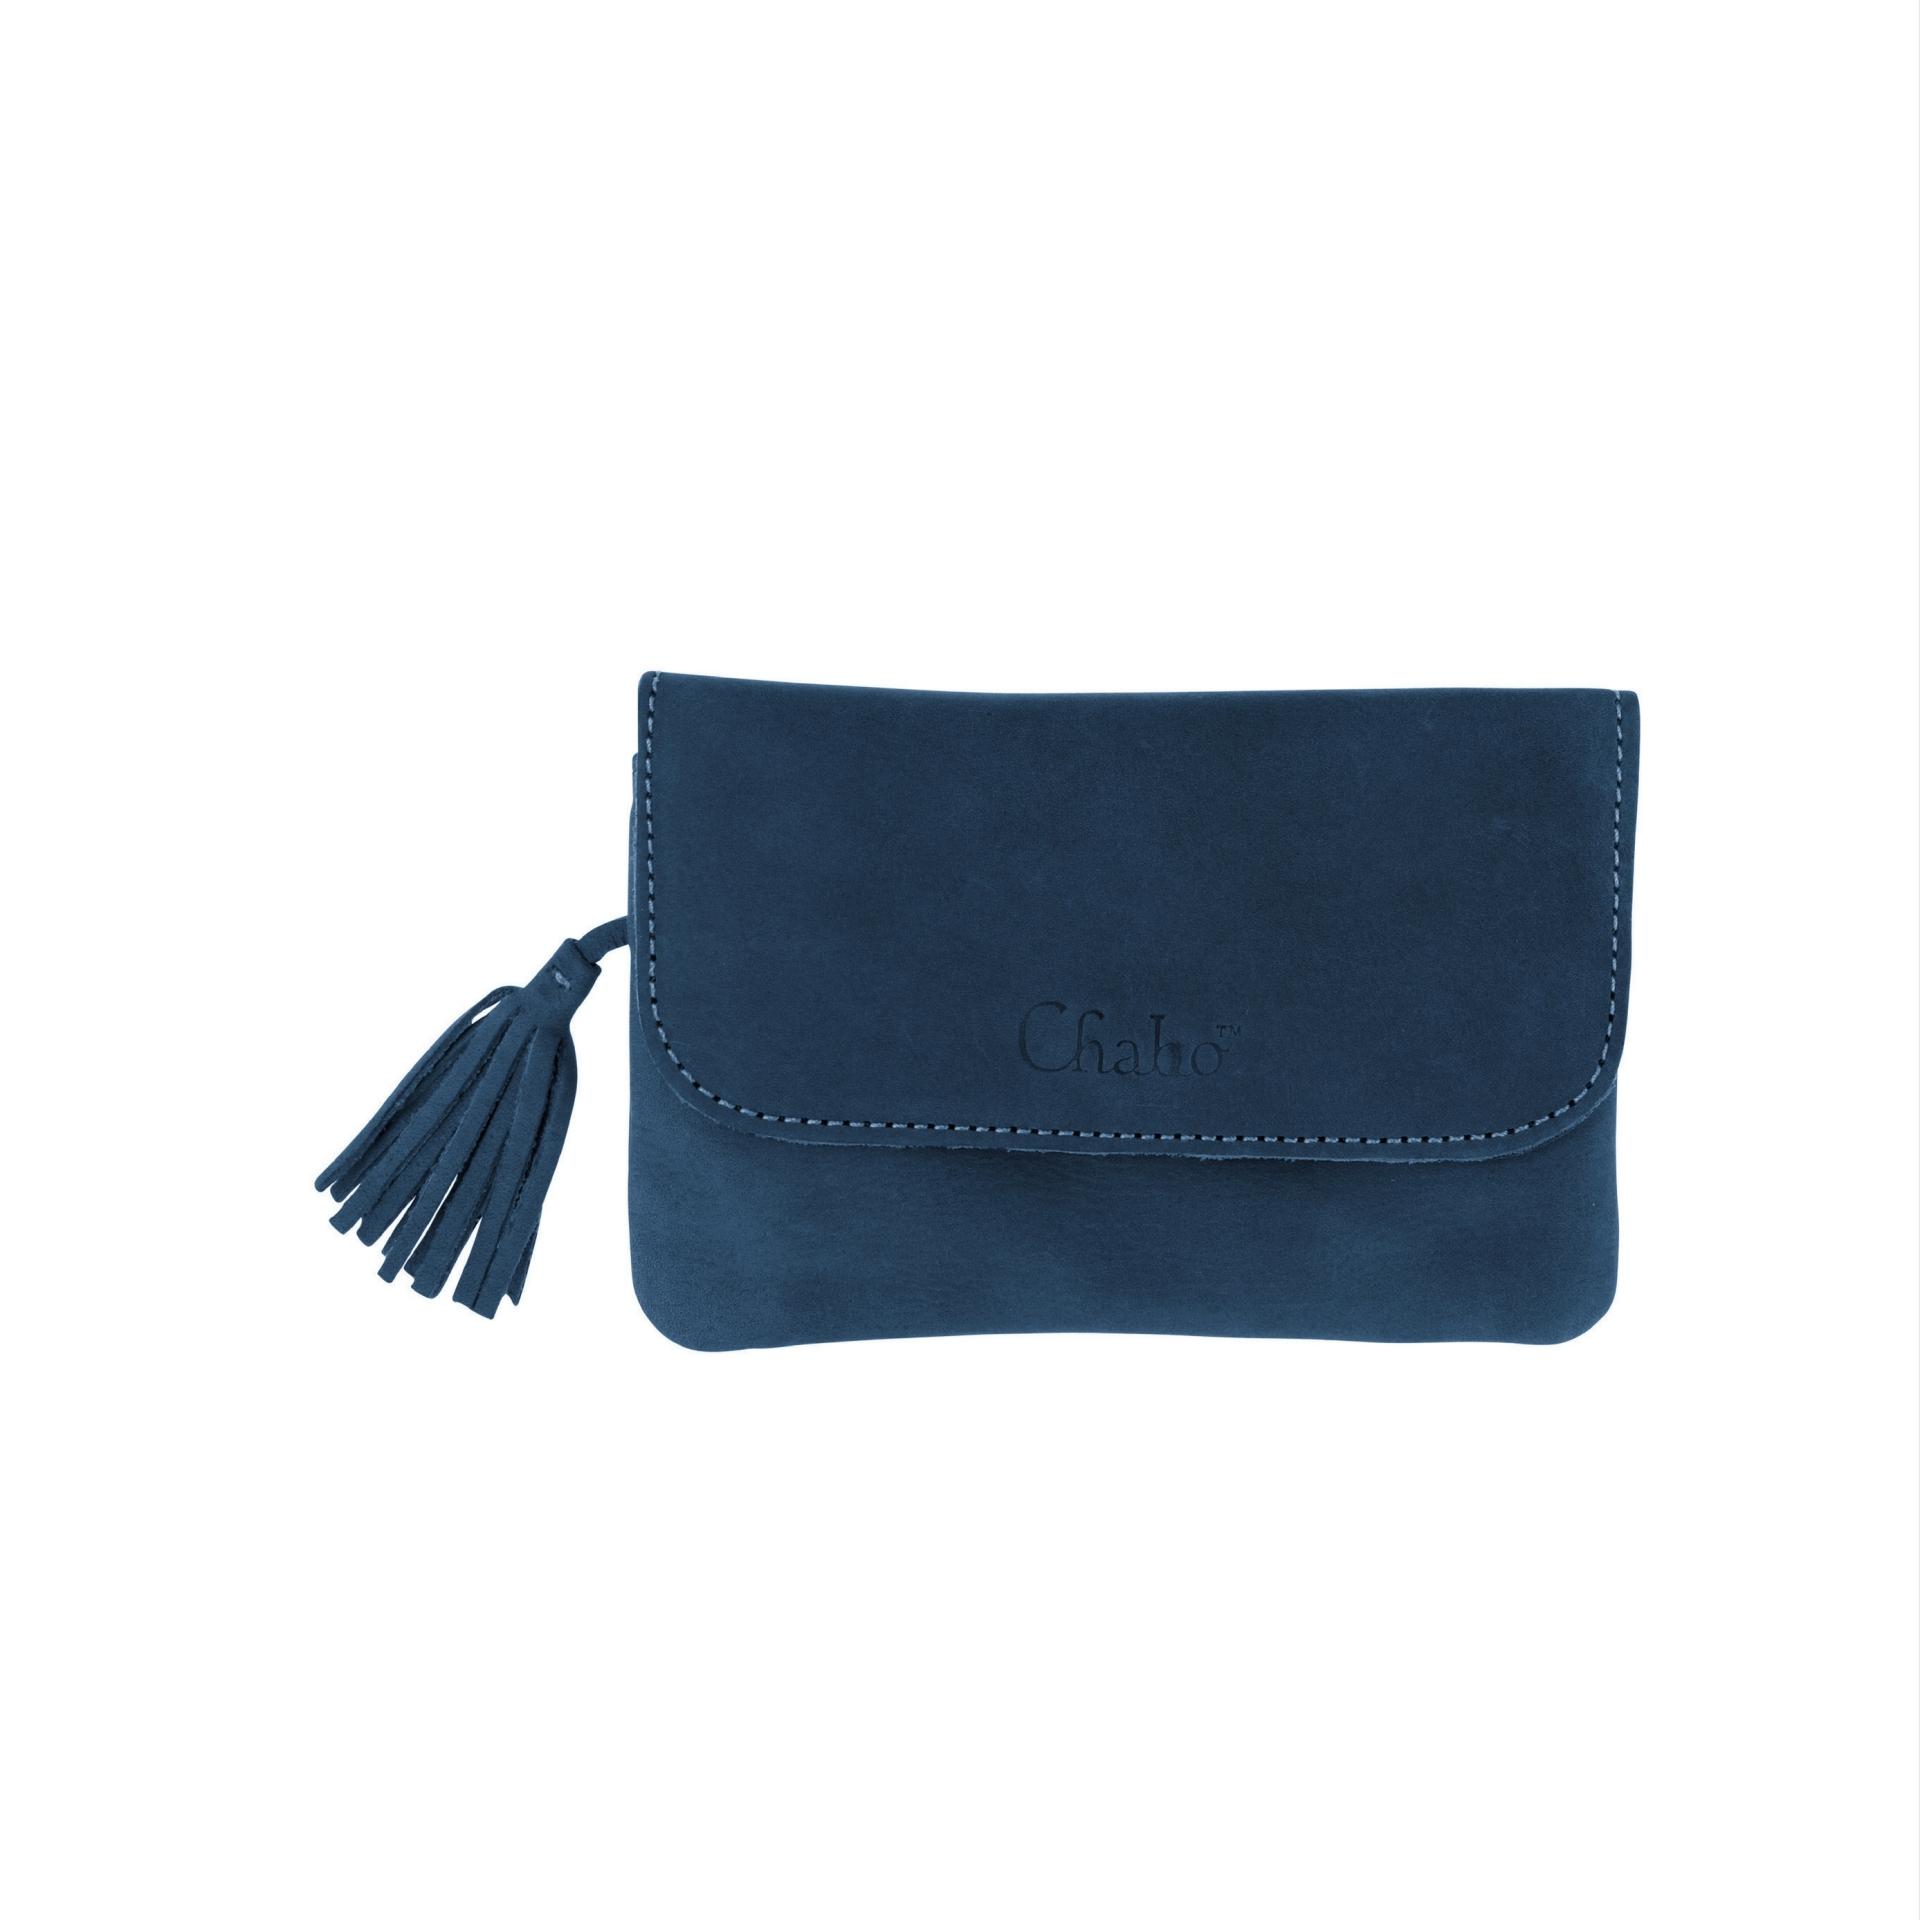 74515fa7feb Chabo Bags Chabo Grande Petit Blue - HiPP & Unique